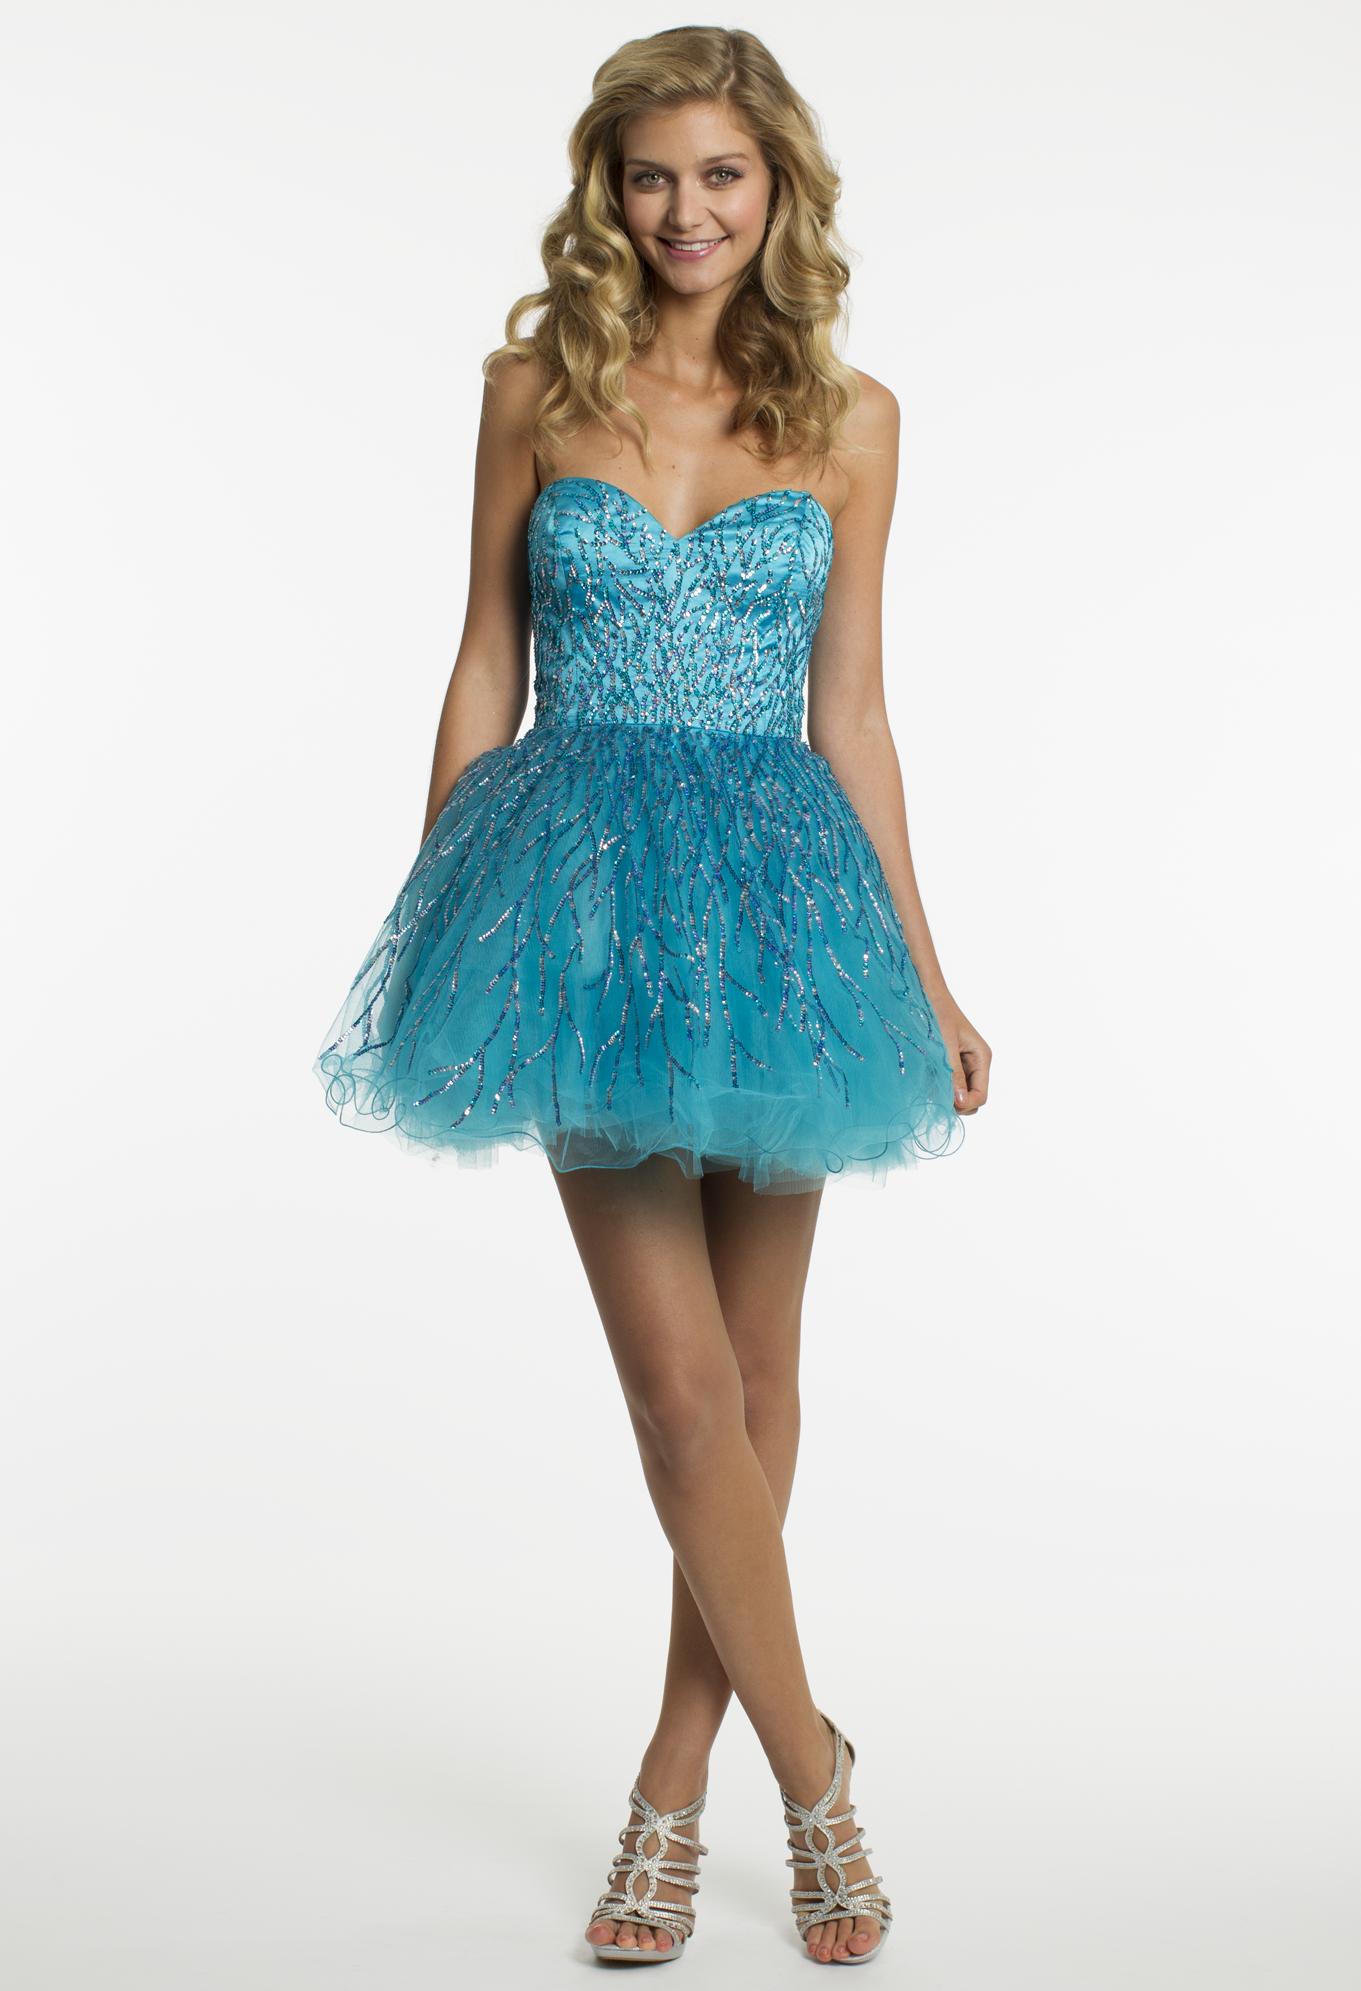 Großzügig Gruppe Usa Prom Kleid Ideen - Brautkleider Ideen ...